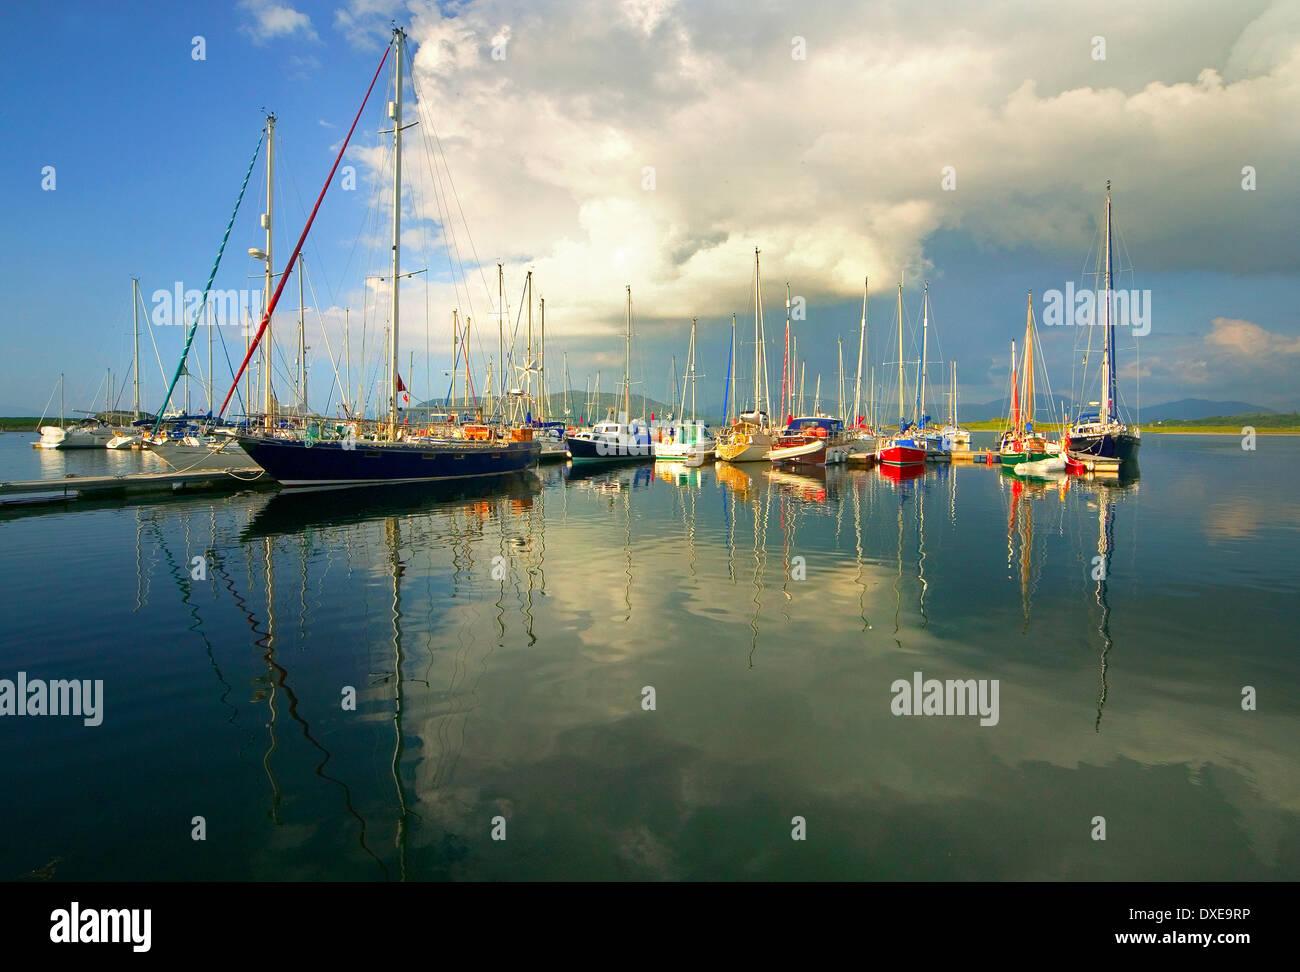 Dunstaffnage yachting marina - Stock Image